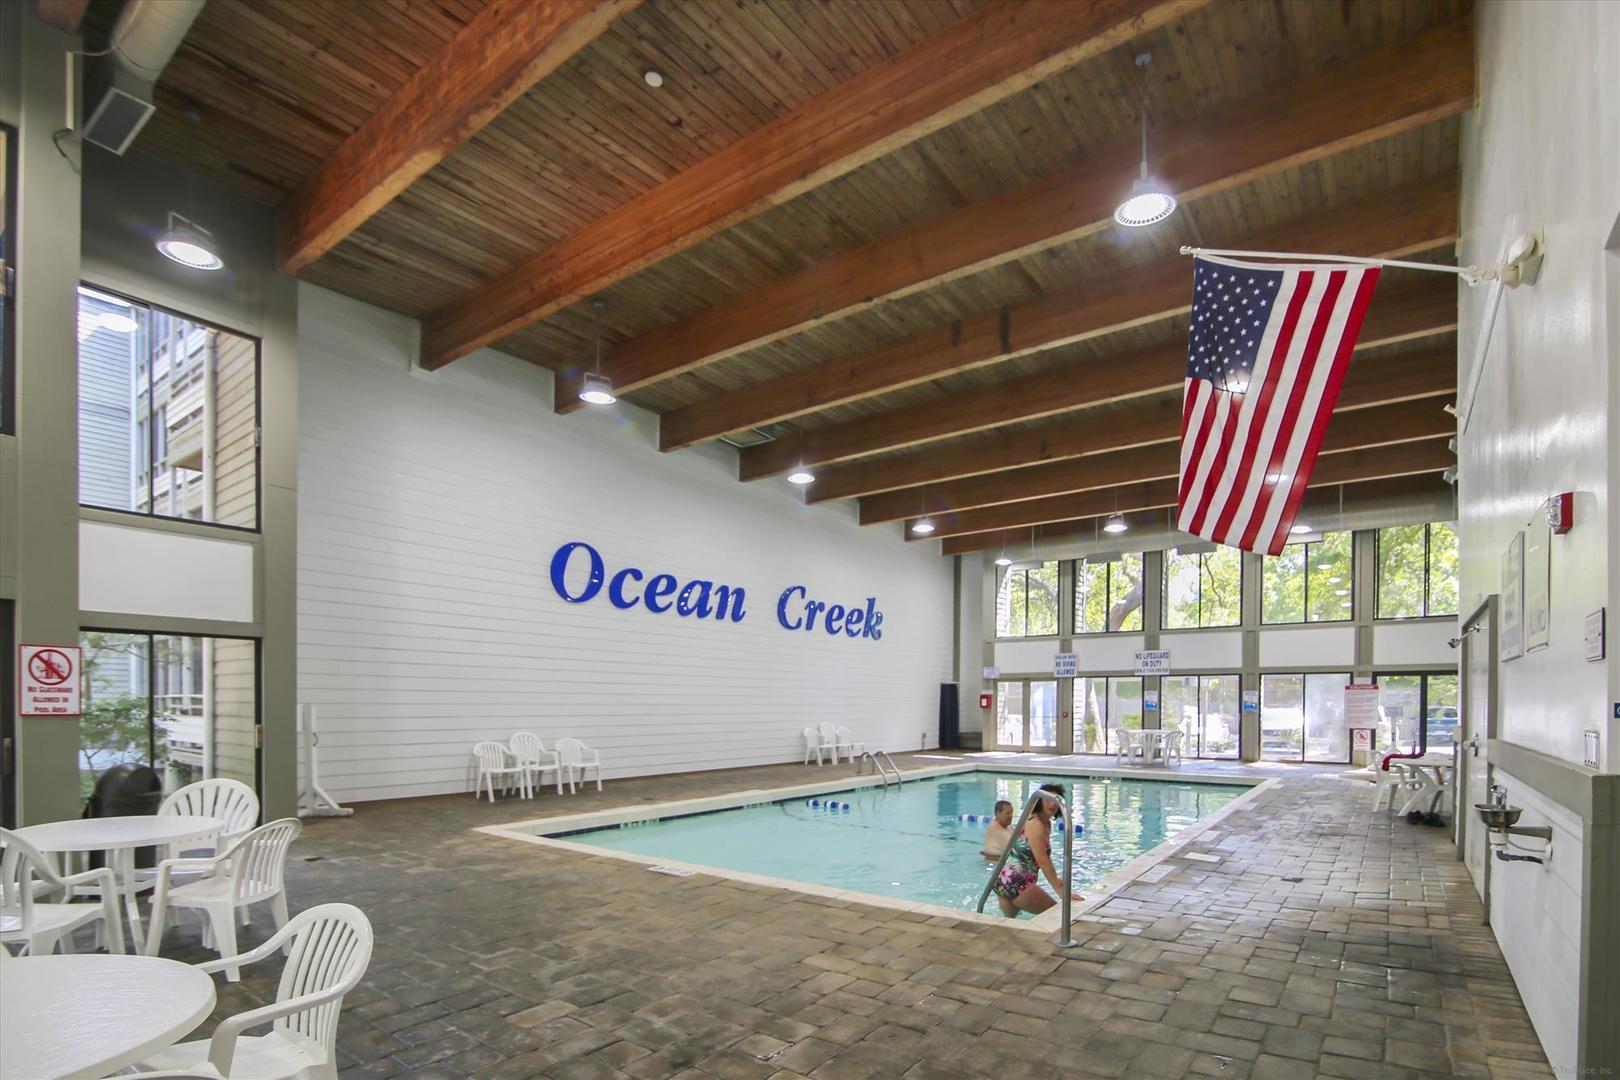 Ocean Creek - Lodge Indoor Pool